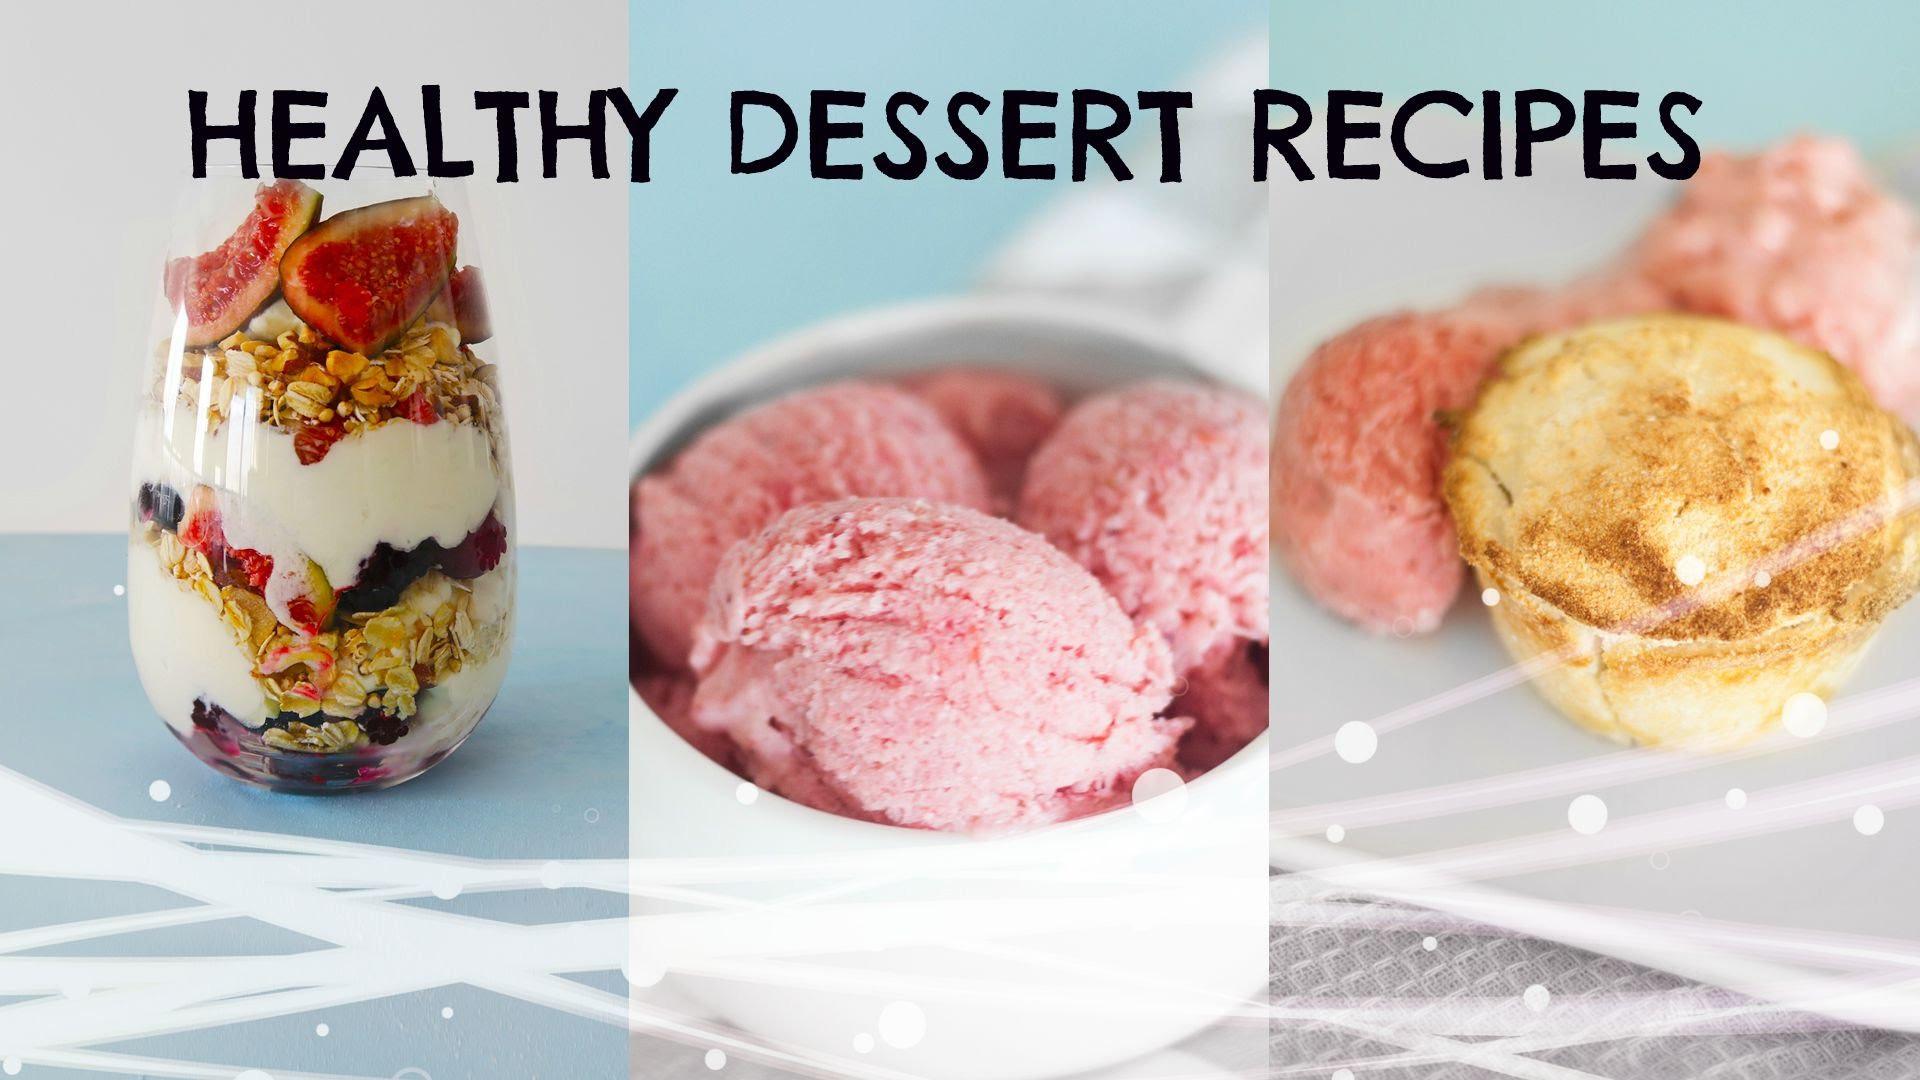 Easy Healthy Desserts Recipes  Healthy DESSERT Recipes simple sweets Rachel Aust